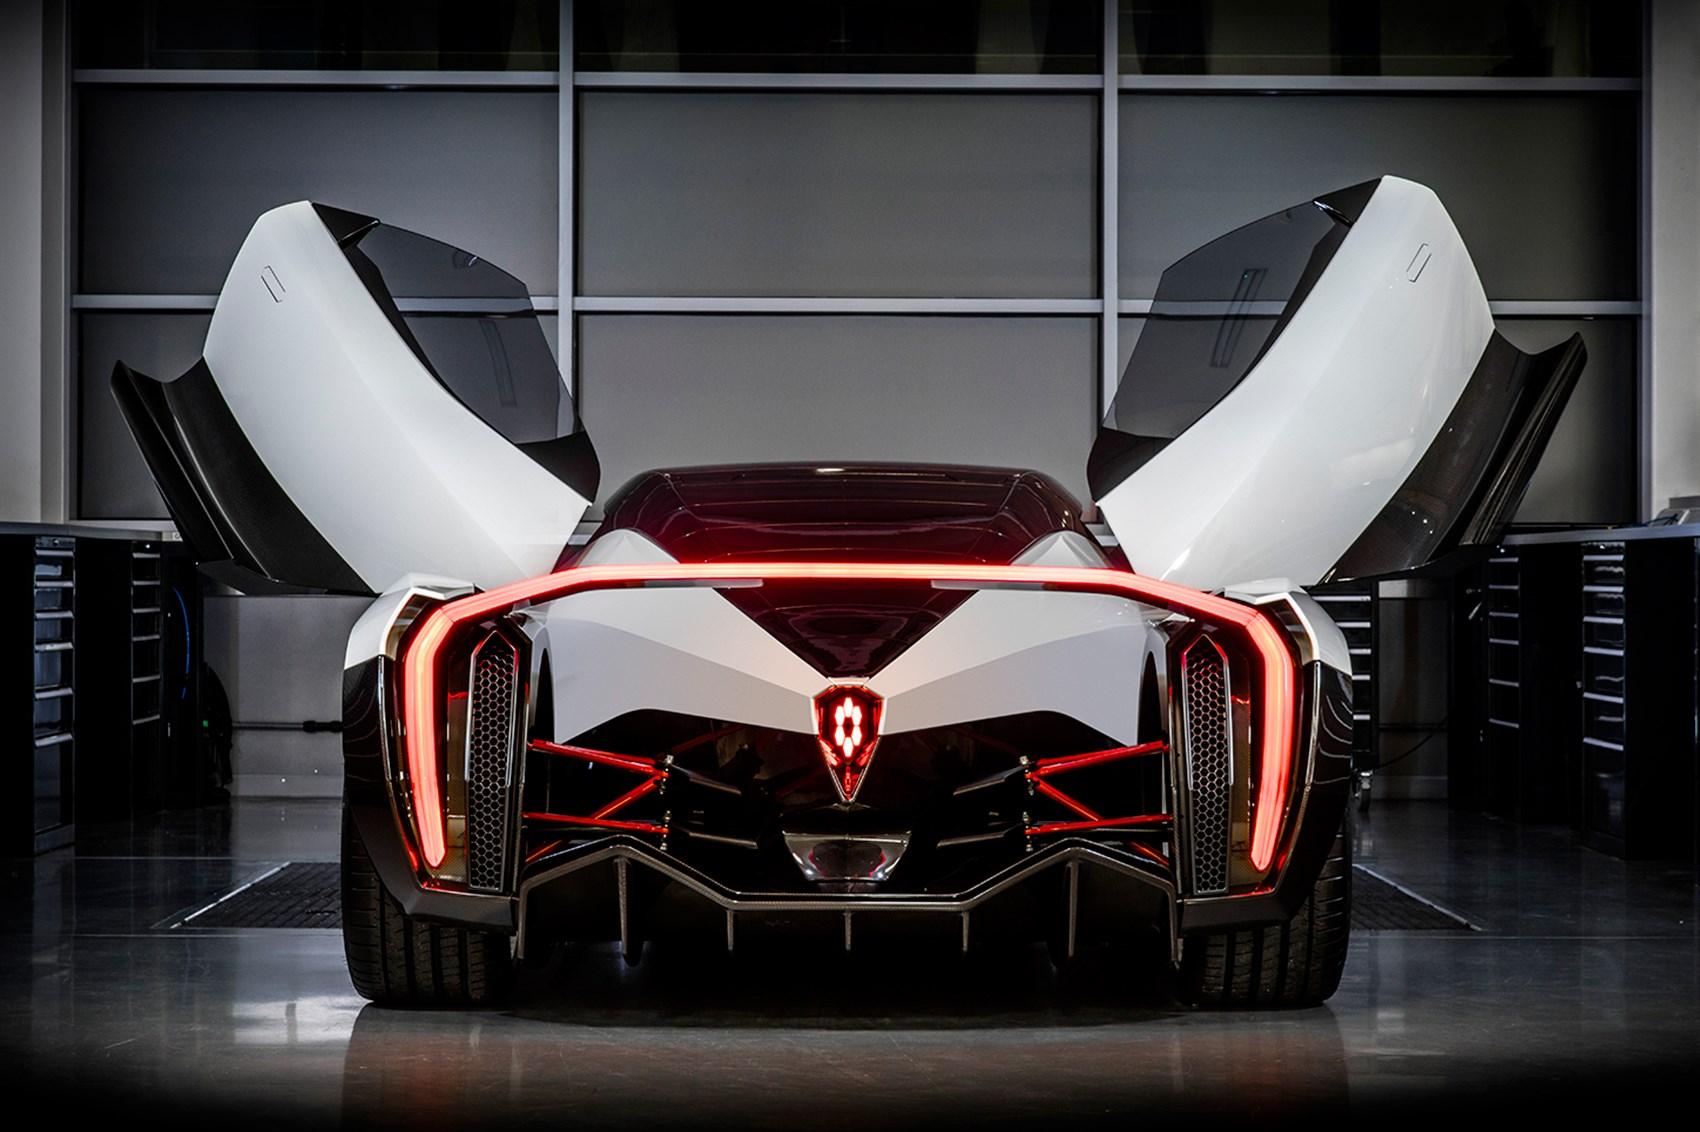 Left To Right Vanda Electrics Ceo Larissa Tan Car S James Taylor Williams Advanced Engineering Ian Cluett